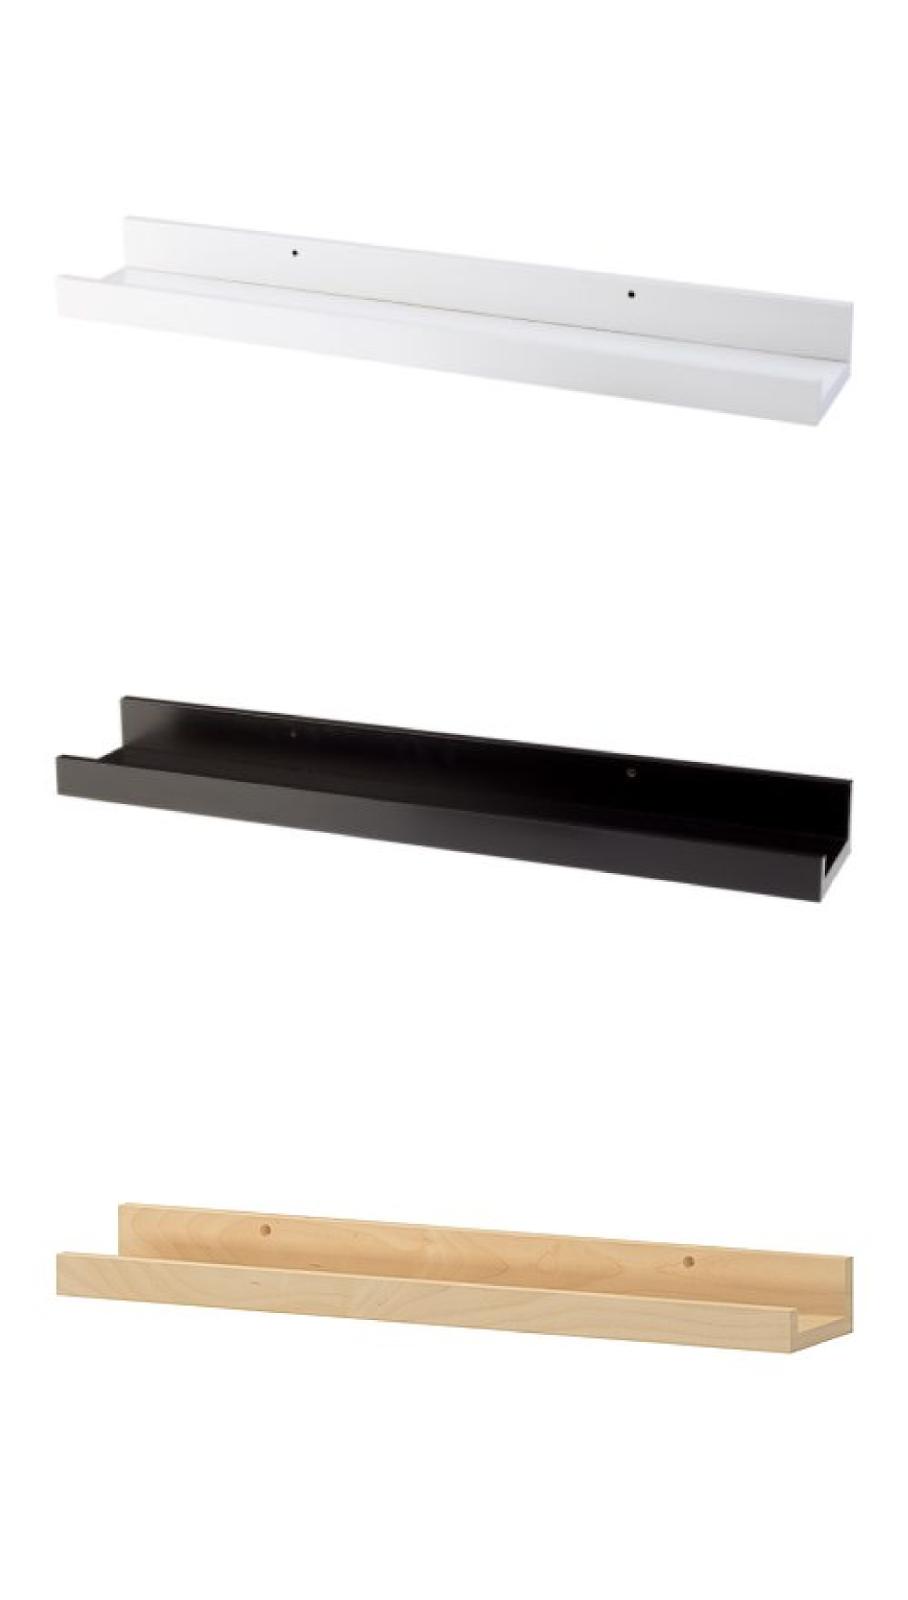 Marq gzgz marq propuesta estante ribba de ikea - Ikea marco de fotos ...